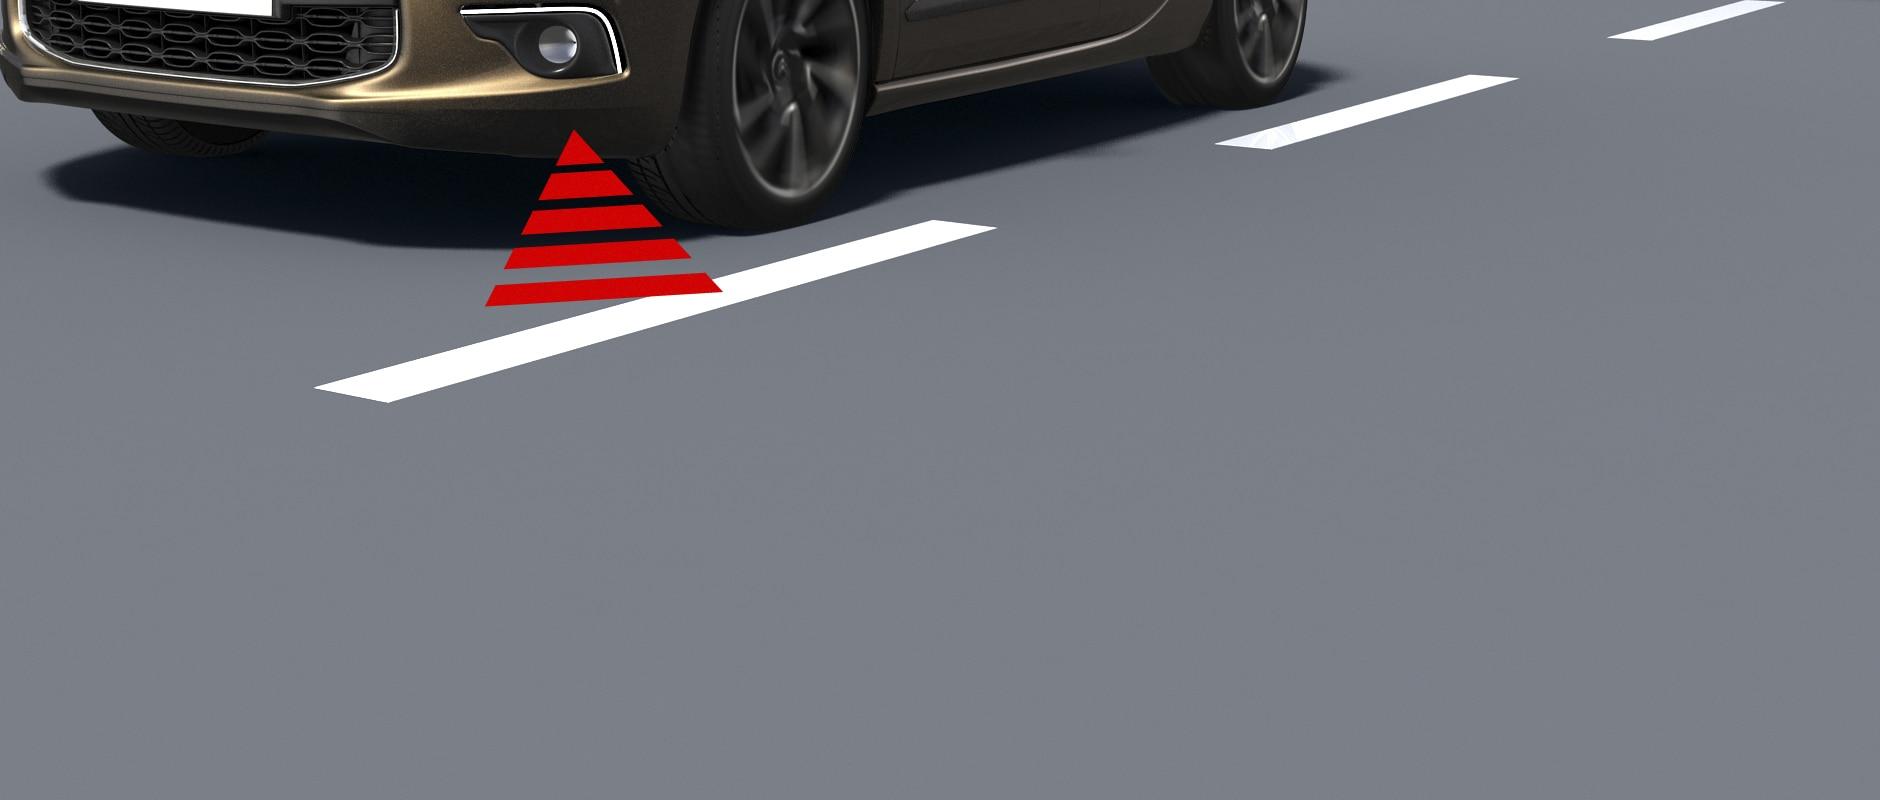 DS 4 Crossback - détails - Tehnologije za bezbednost